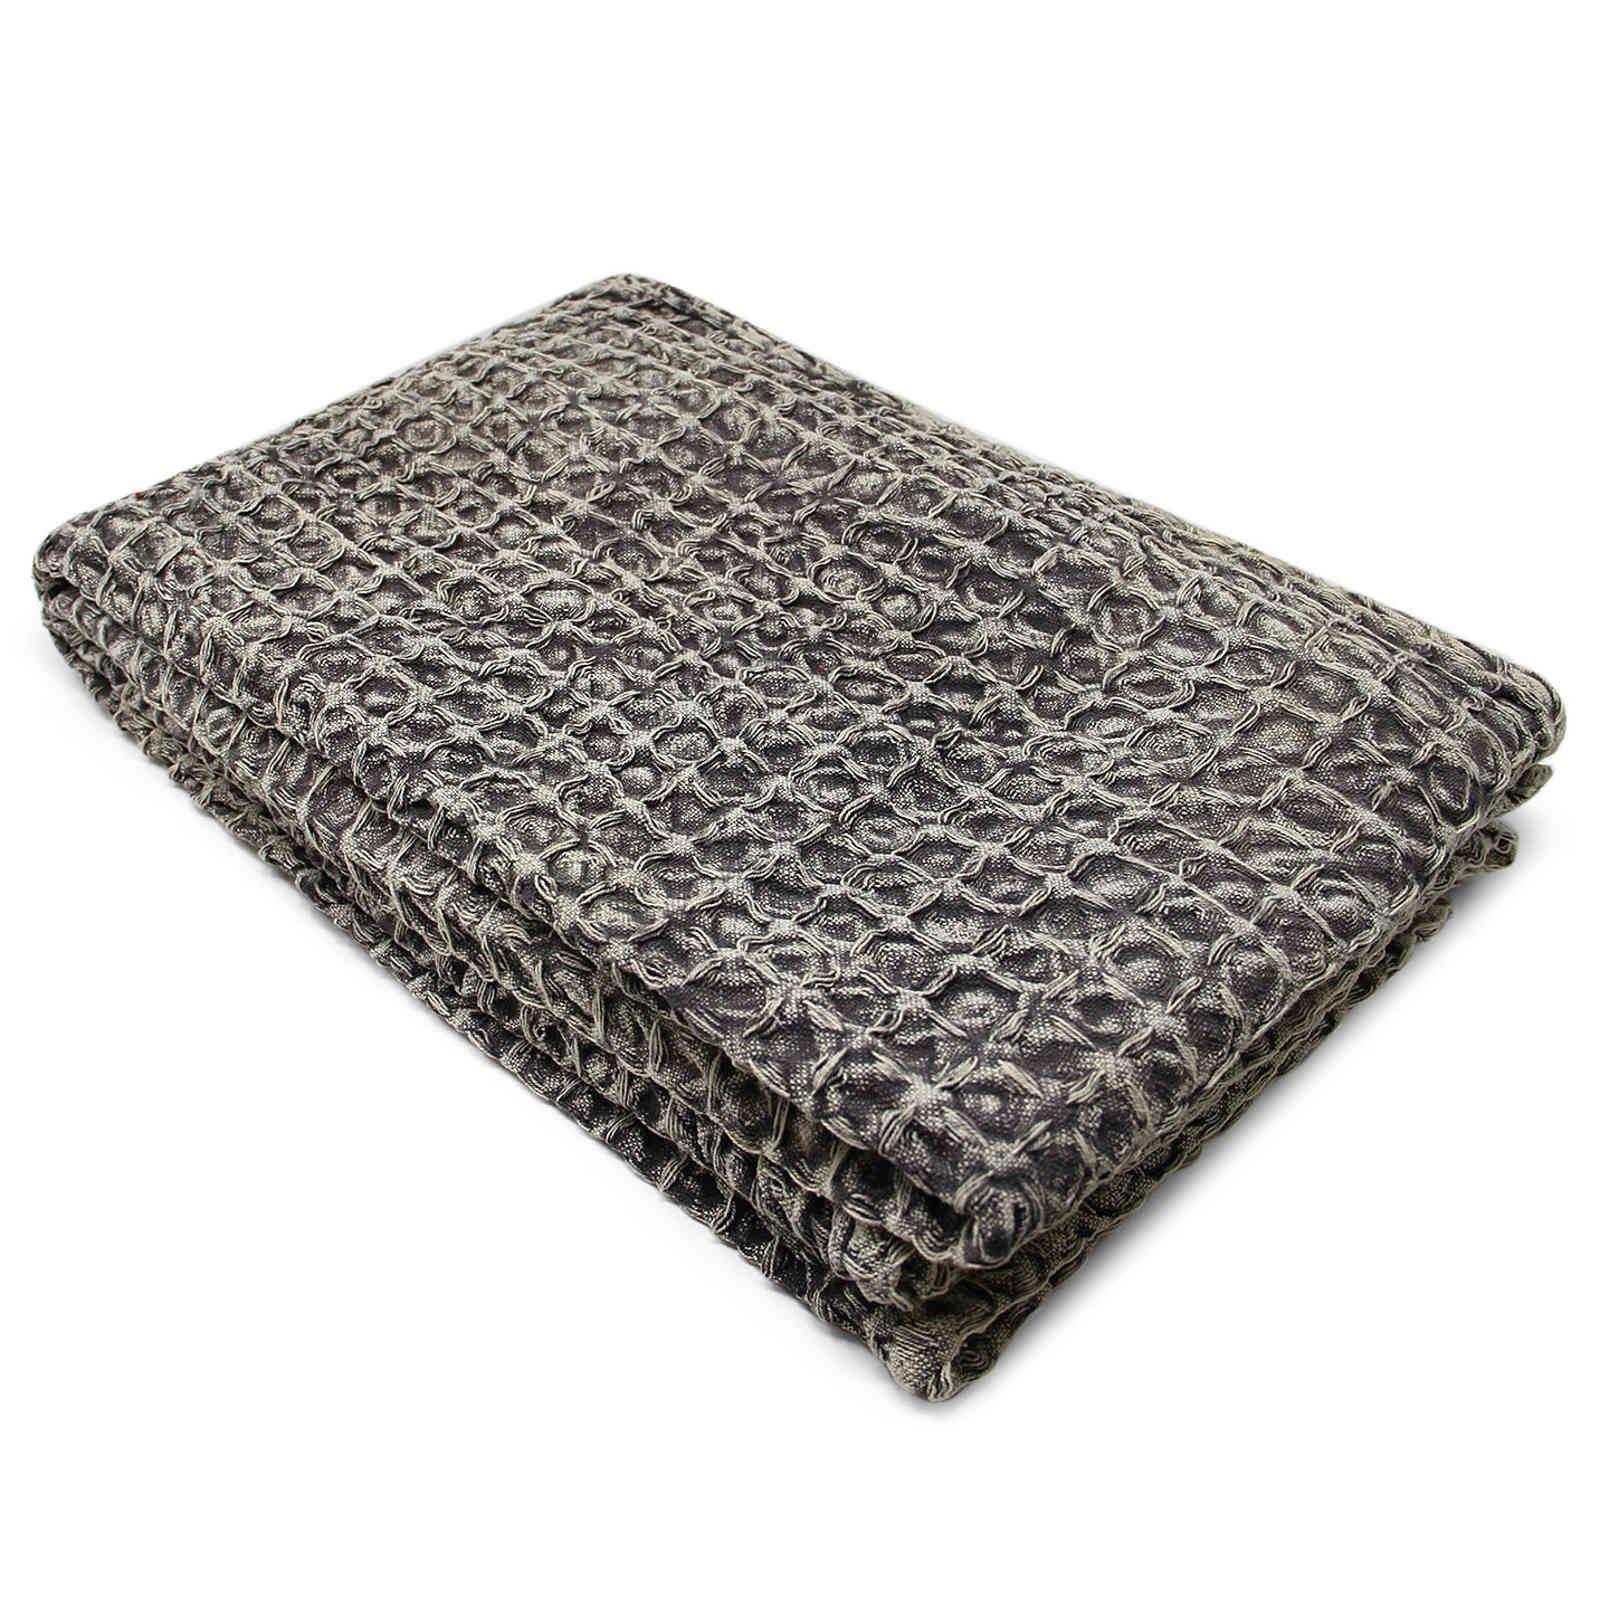 Oregon-Stonewash-Waffle-Throw-Modern-Distressed-Sofa-Bed-Blankets-100-Cotton thumbnail 11